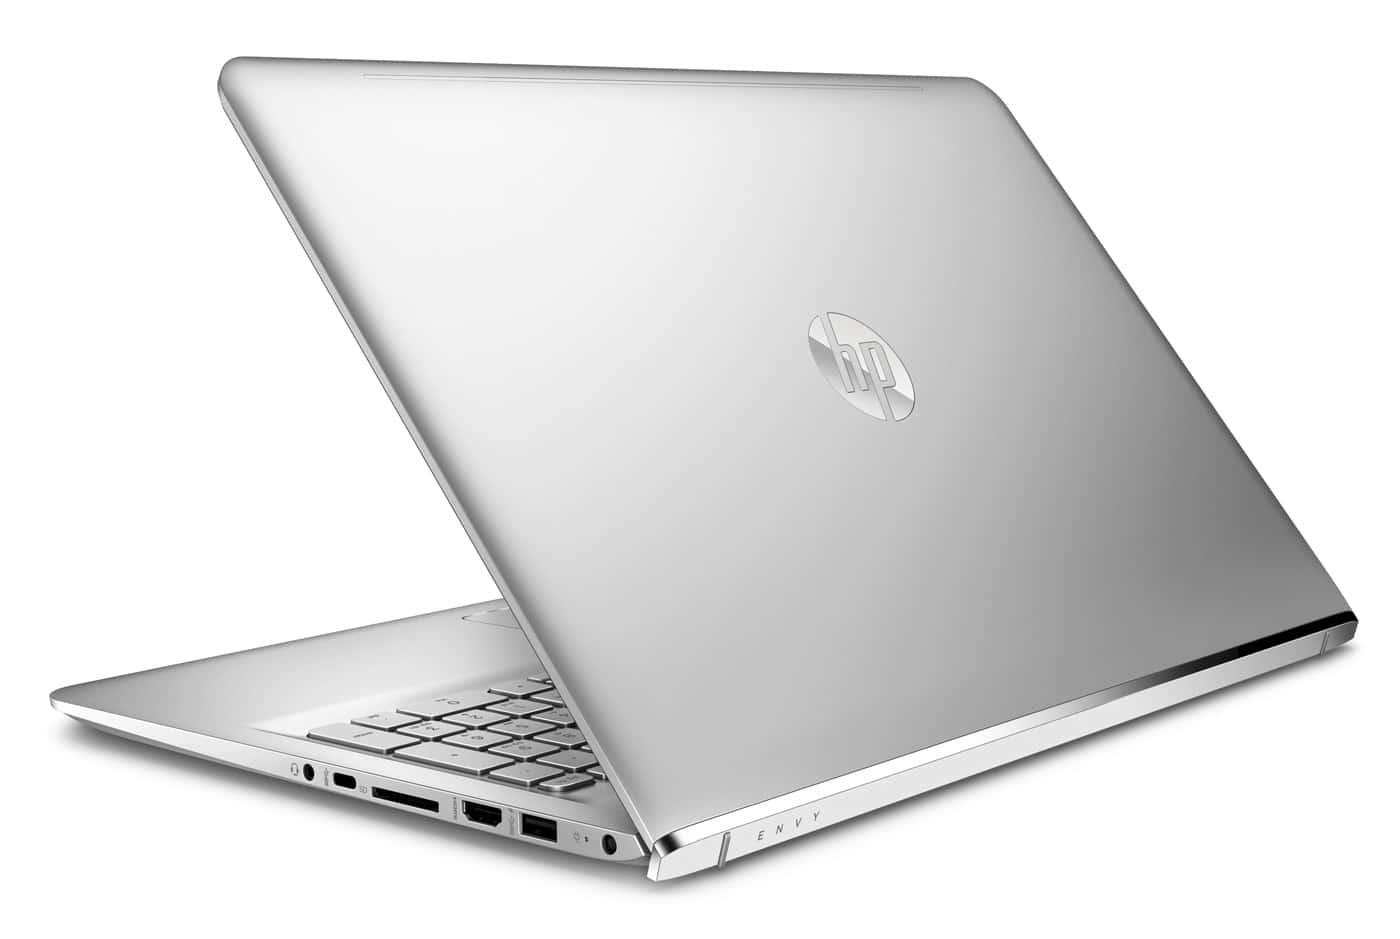 HP Envy 15-as111nf, ultrabook 15 pouces léger i7 Kaby SSD256 16Go Iris à 1235€